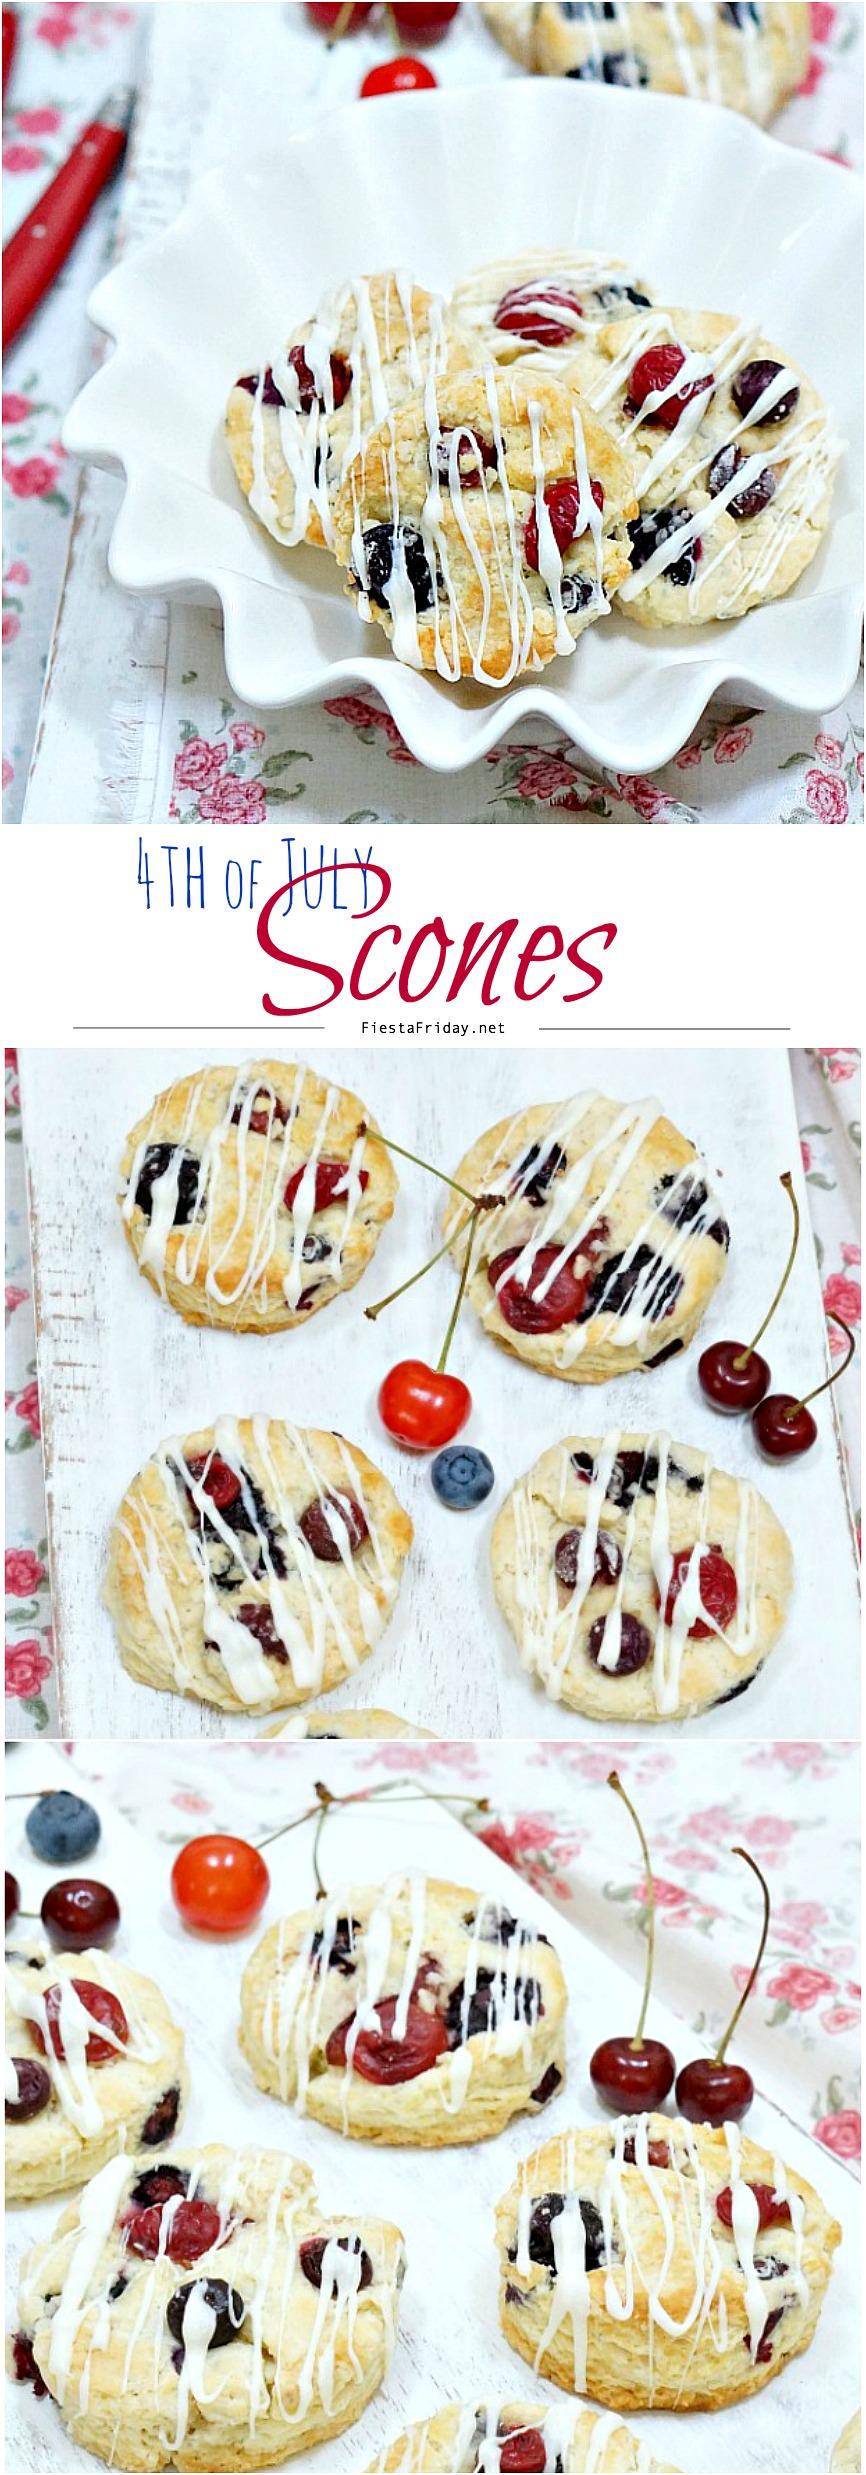 4th of july scones | fiestafriday.net